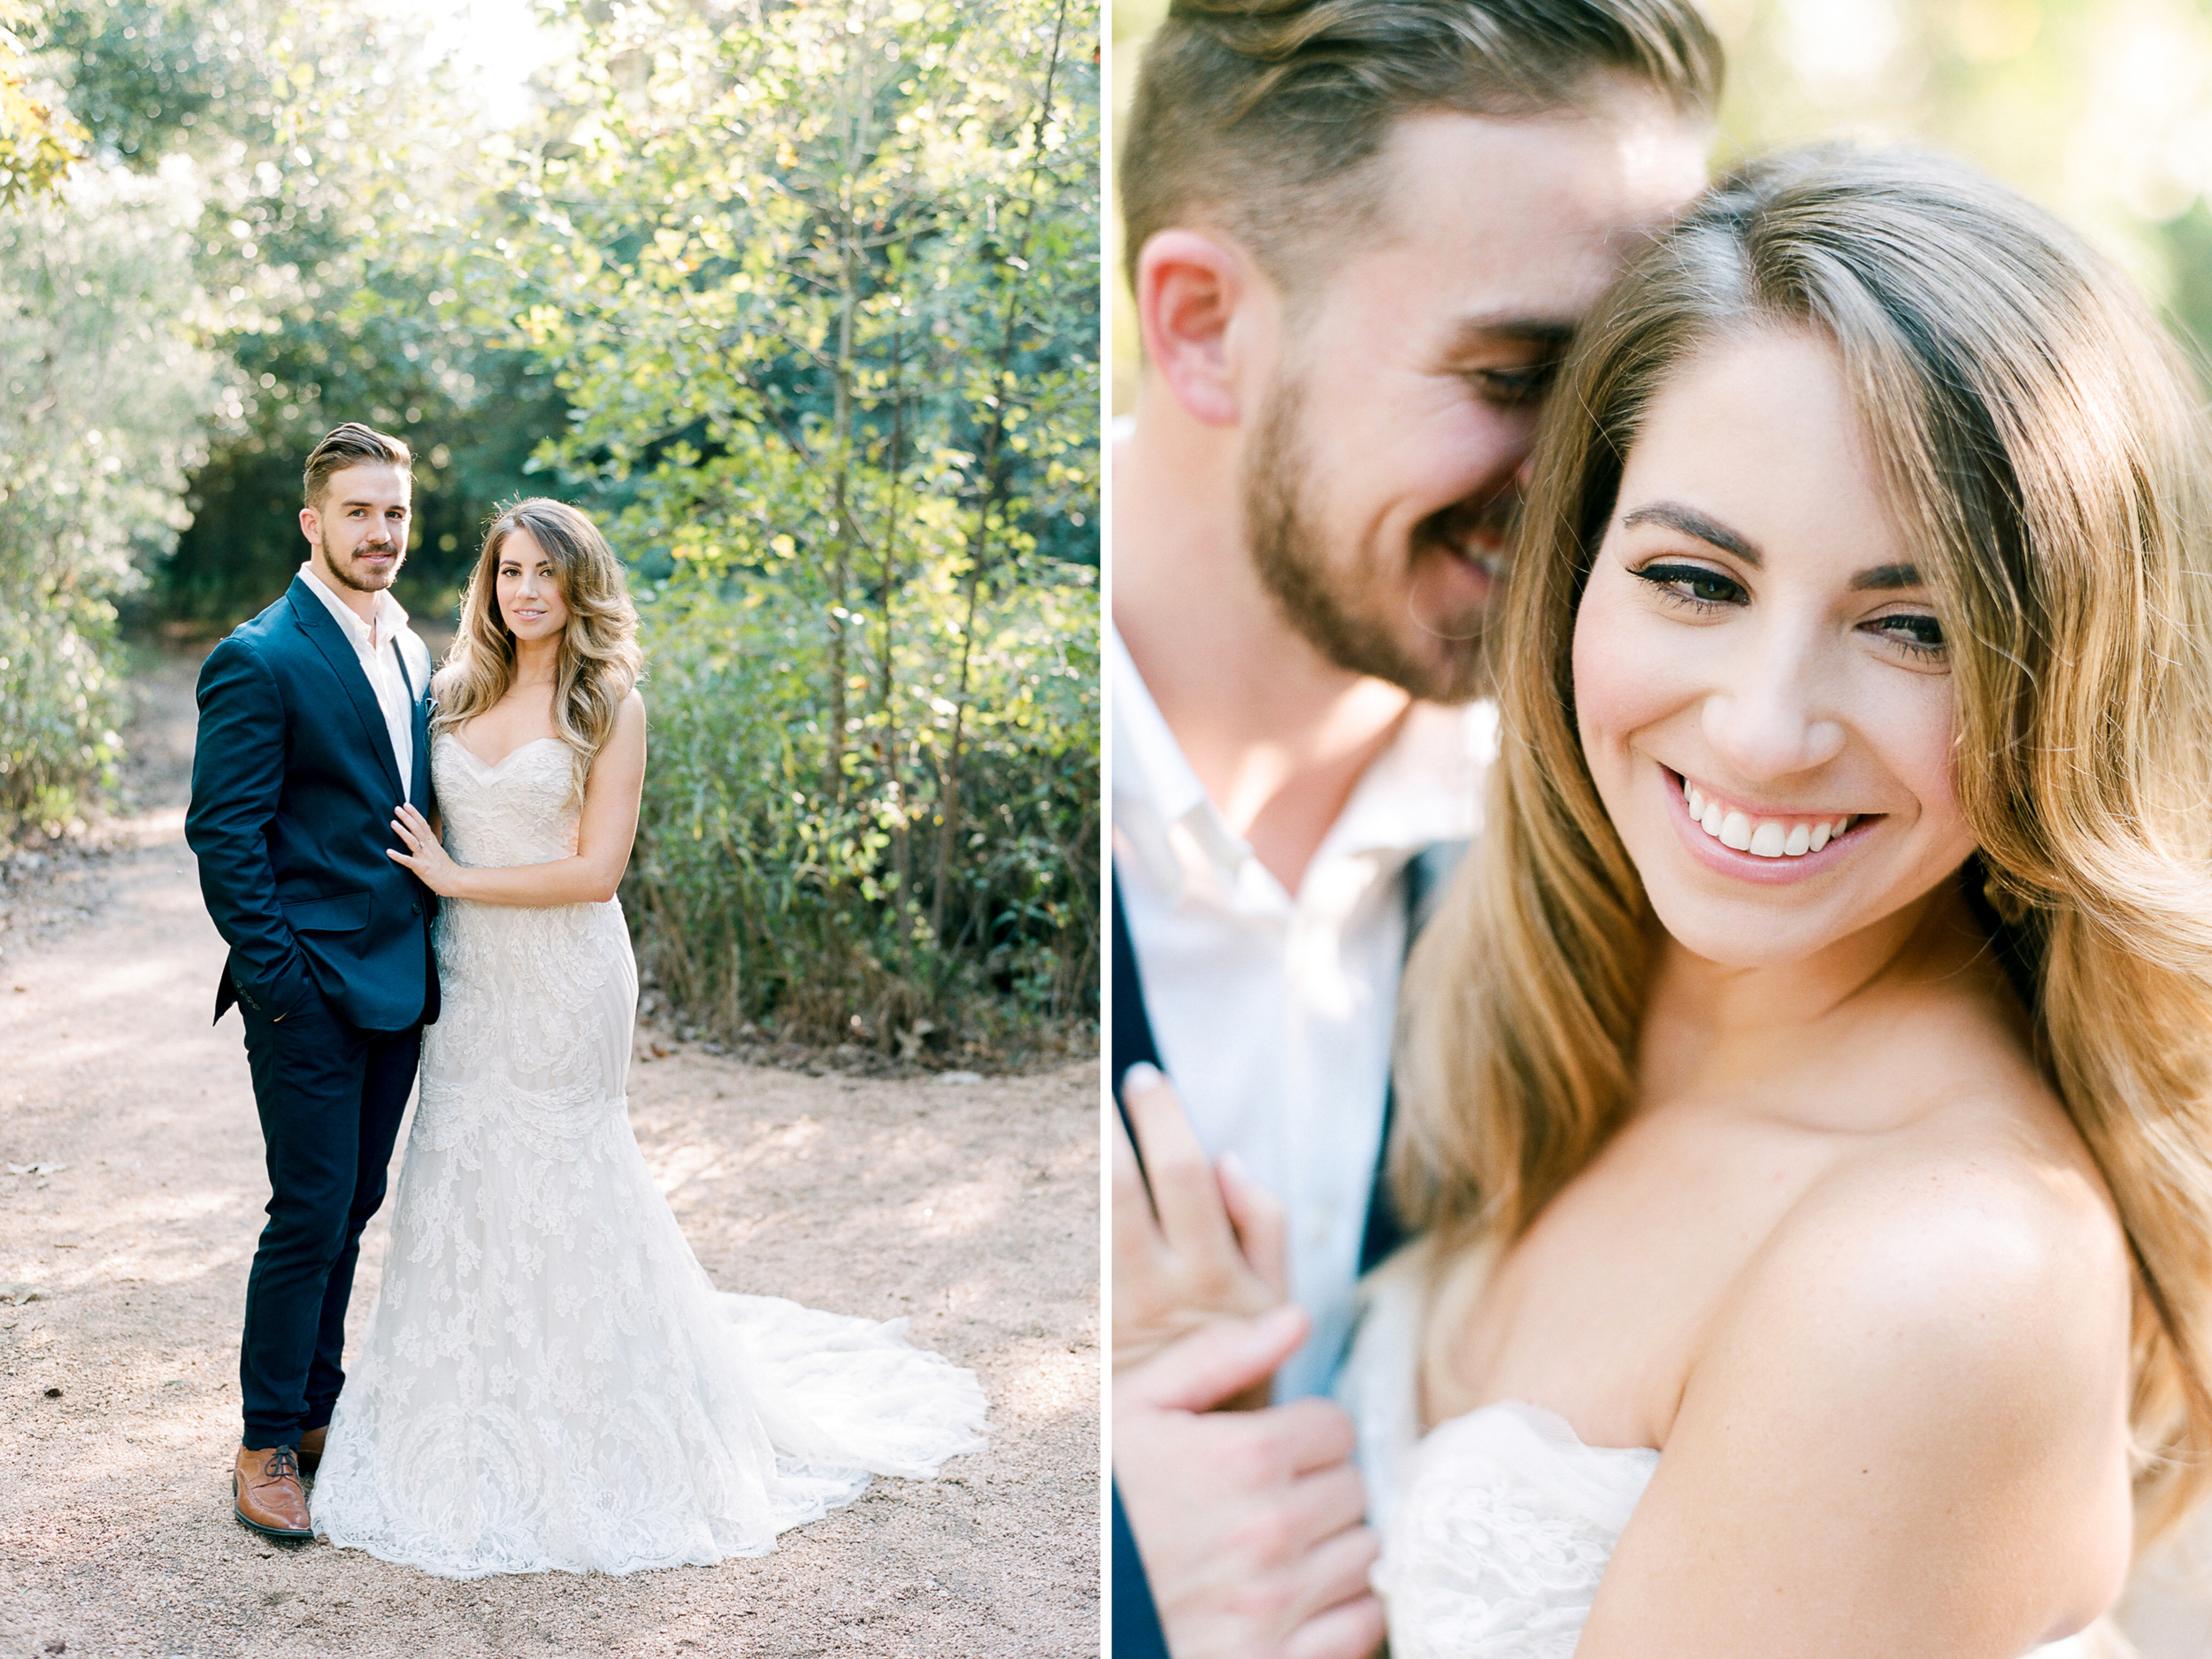 dana-fernandez-photography-the-wedding-chicks-film-houston-wedding-photography-destination-109.jpg